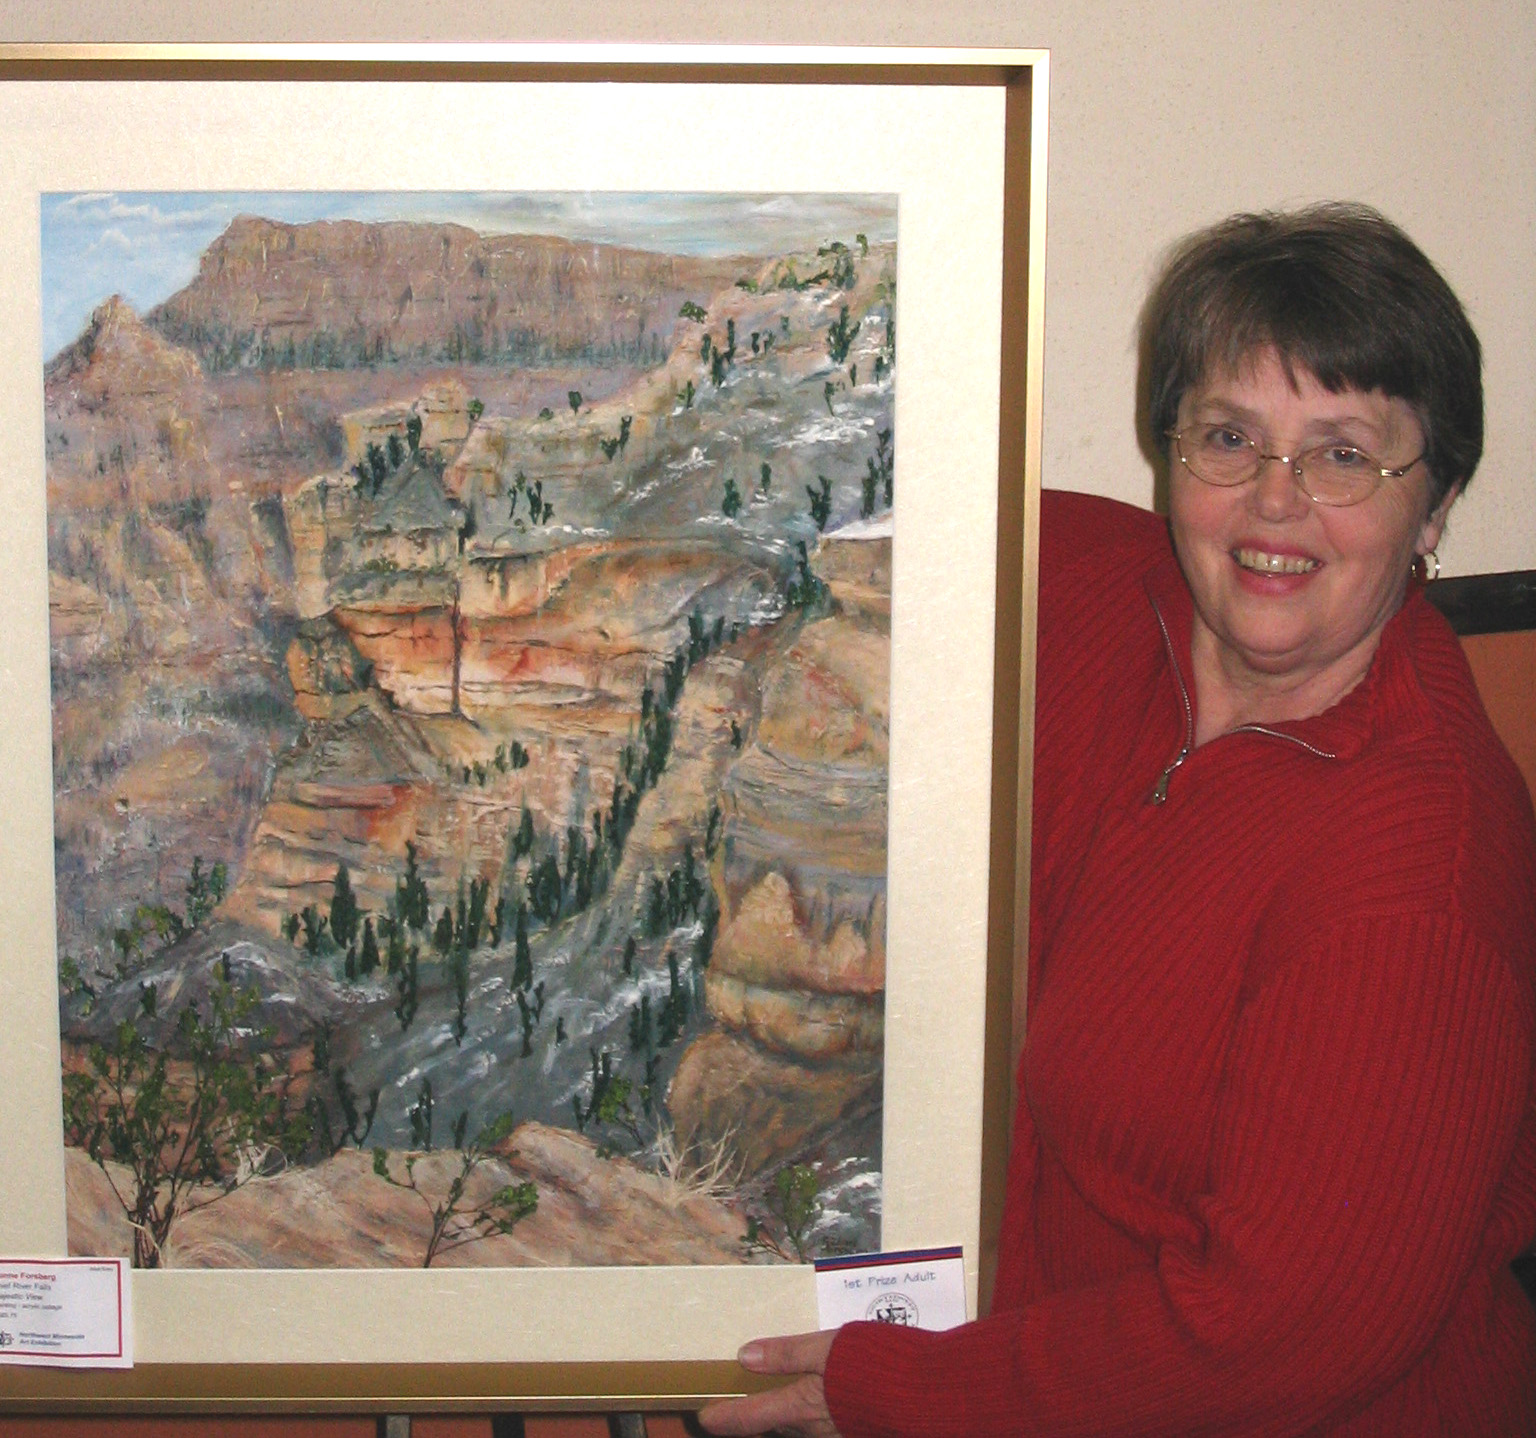 Caption: LaVonne Forsberg of Thief River Falls, Minnesota.